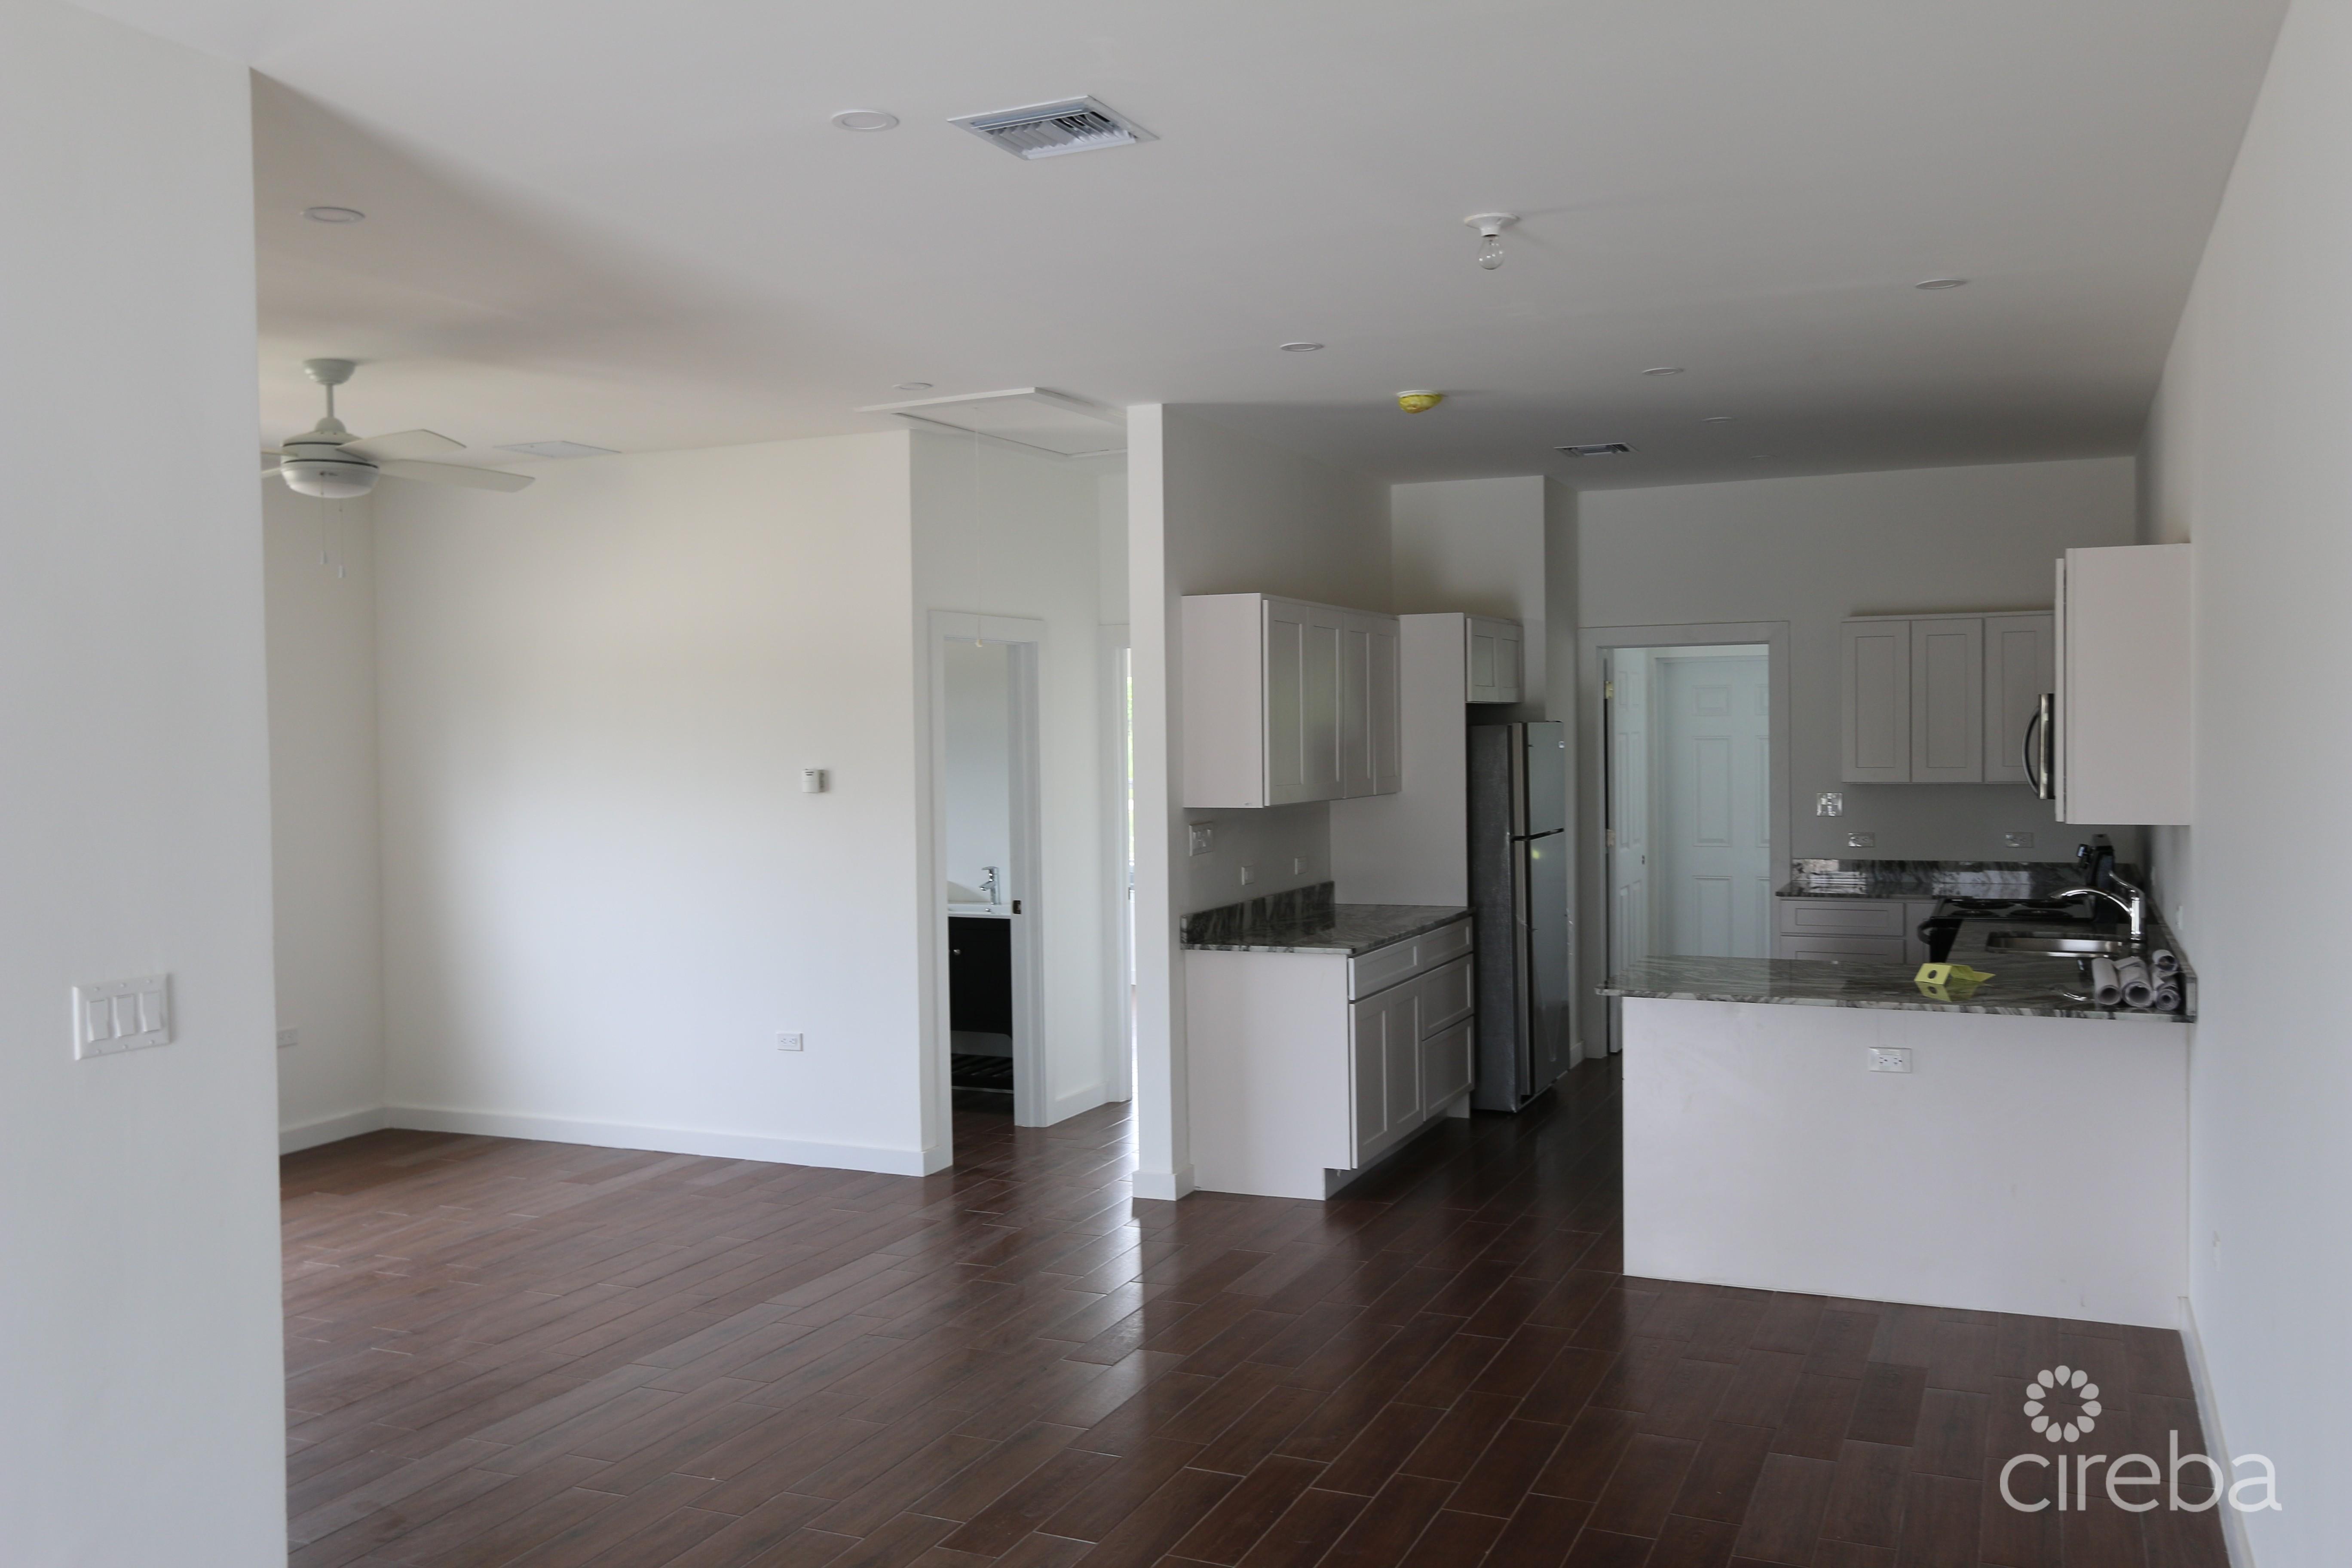 LOOKOUT GARDENS - PRE-CONSTRUCTION DUPLEX - 2 BEDROOM UNIT #4